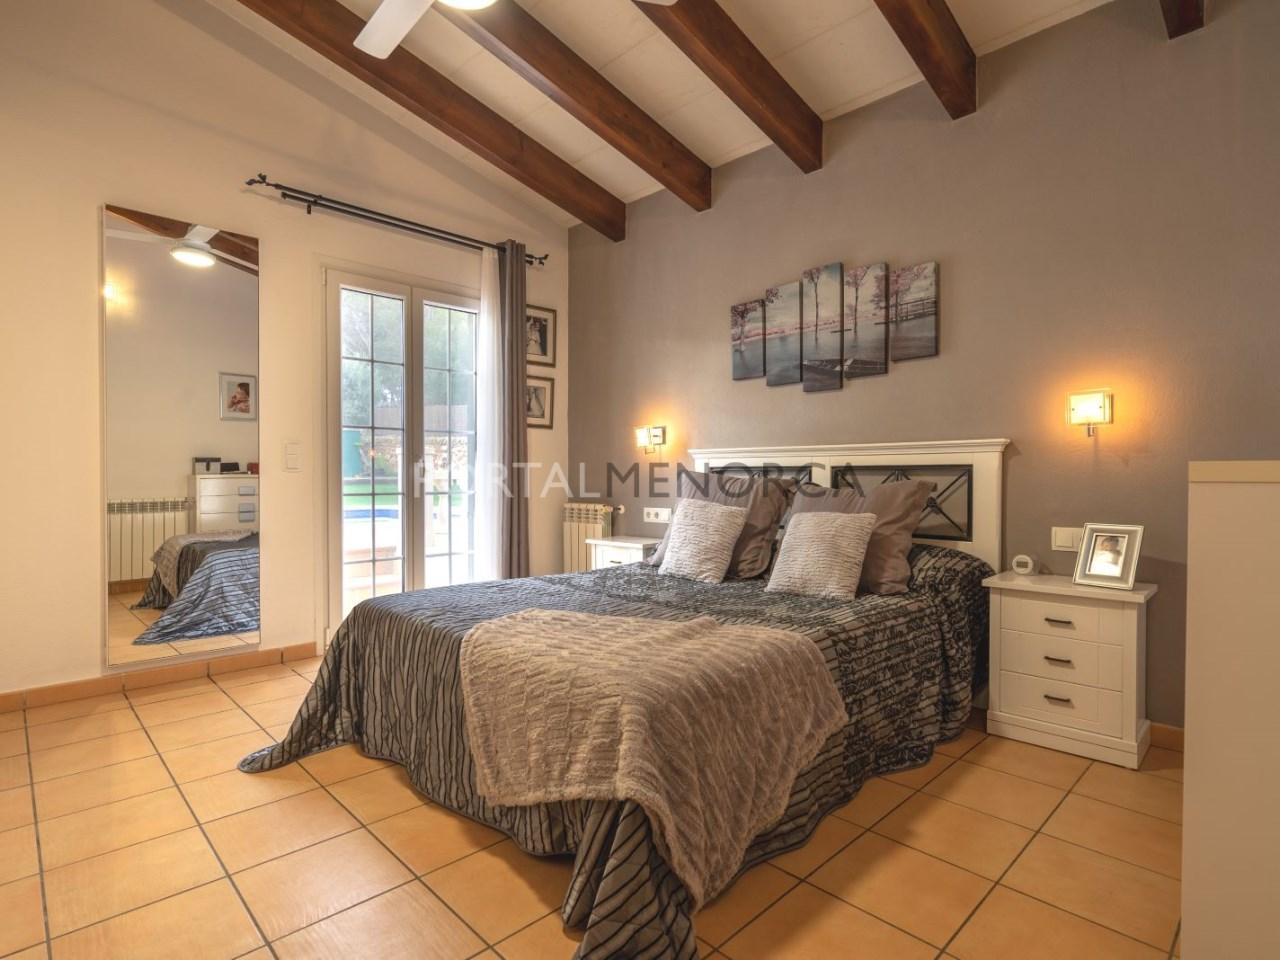 maison-campagne-acheter-menorca (2)